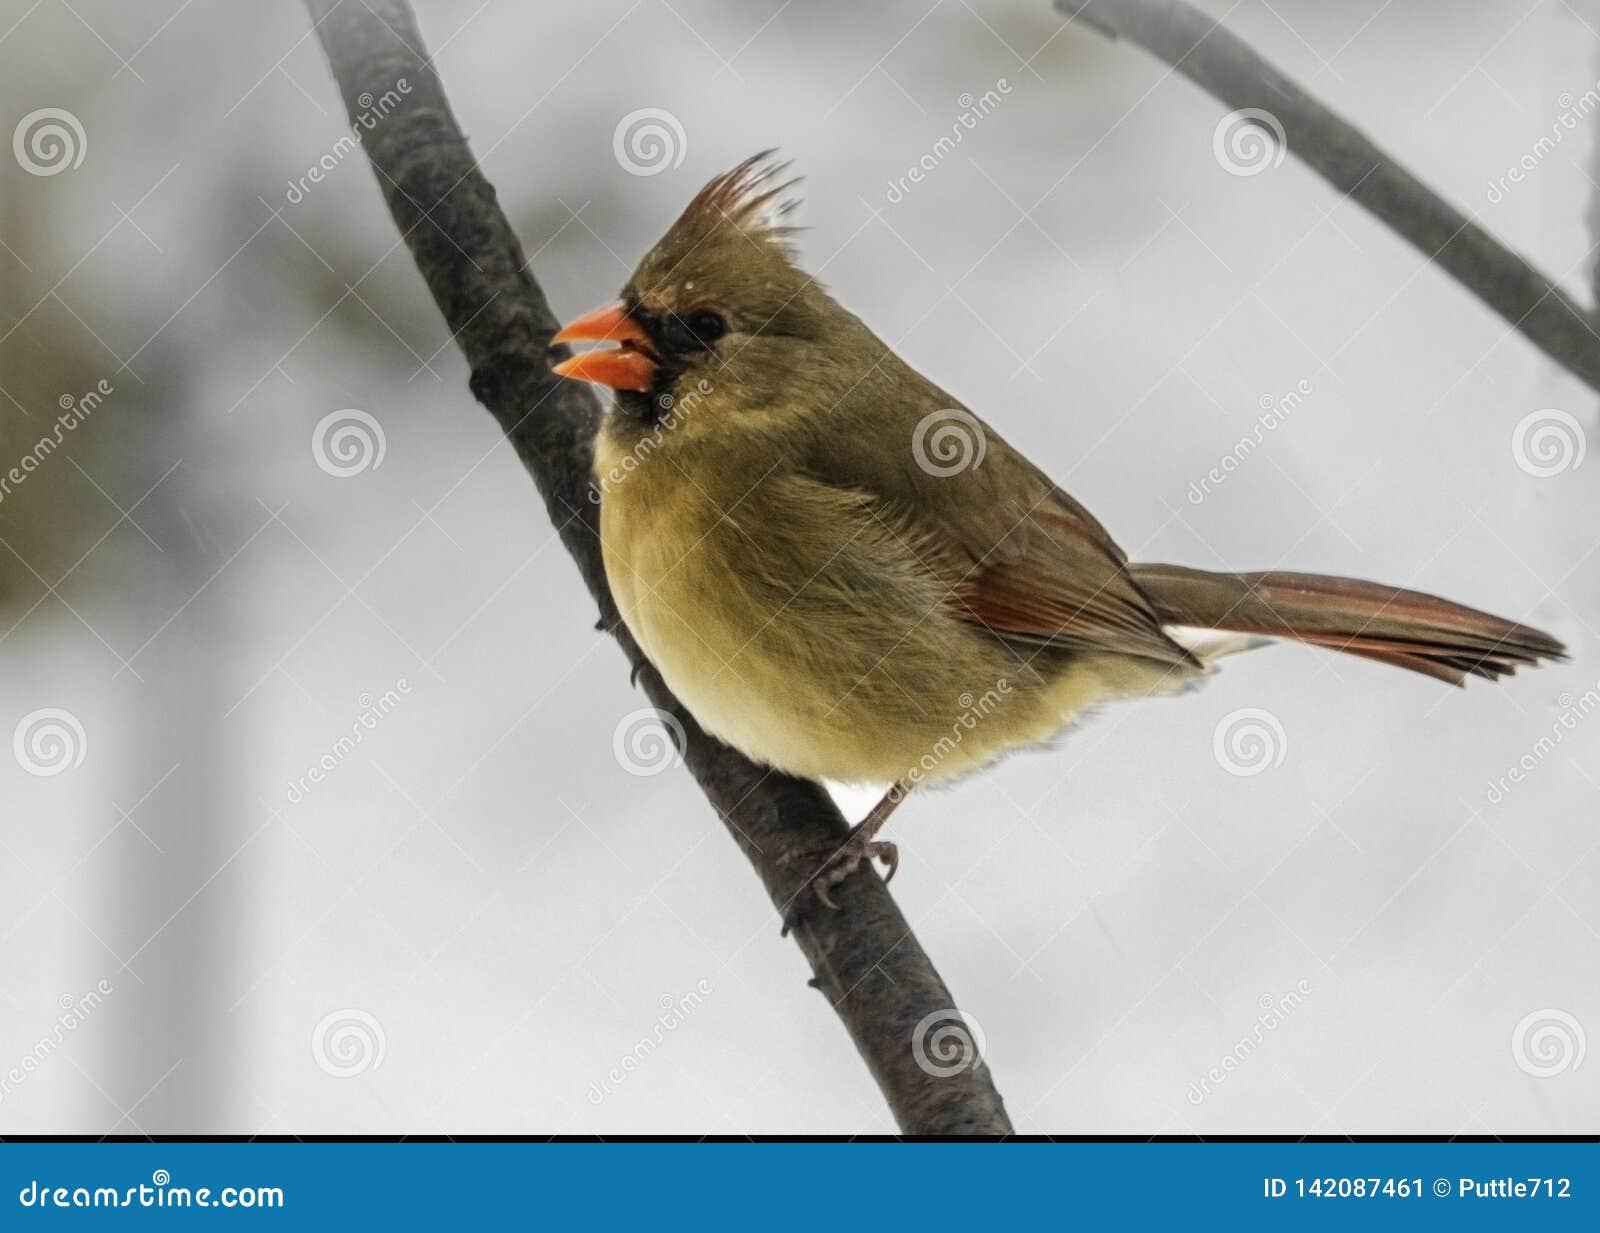 Braces Itself Against cardinal femenino la nieve